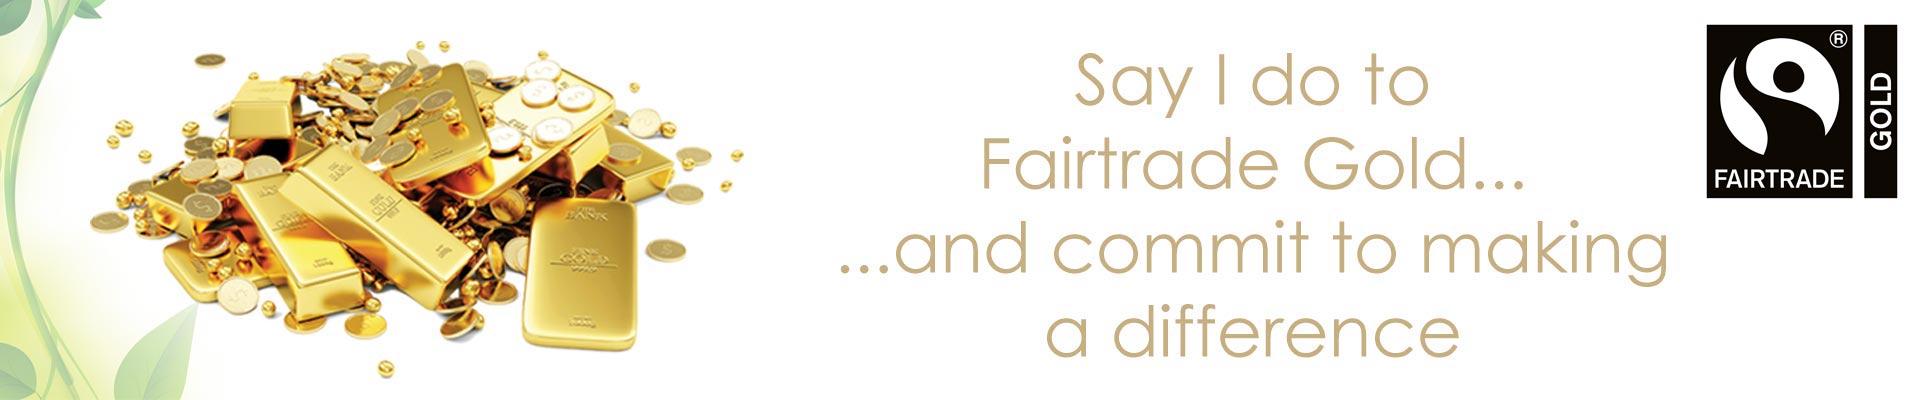 buy fairtrade gold bullion